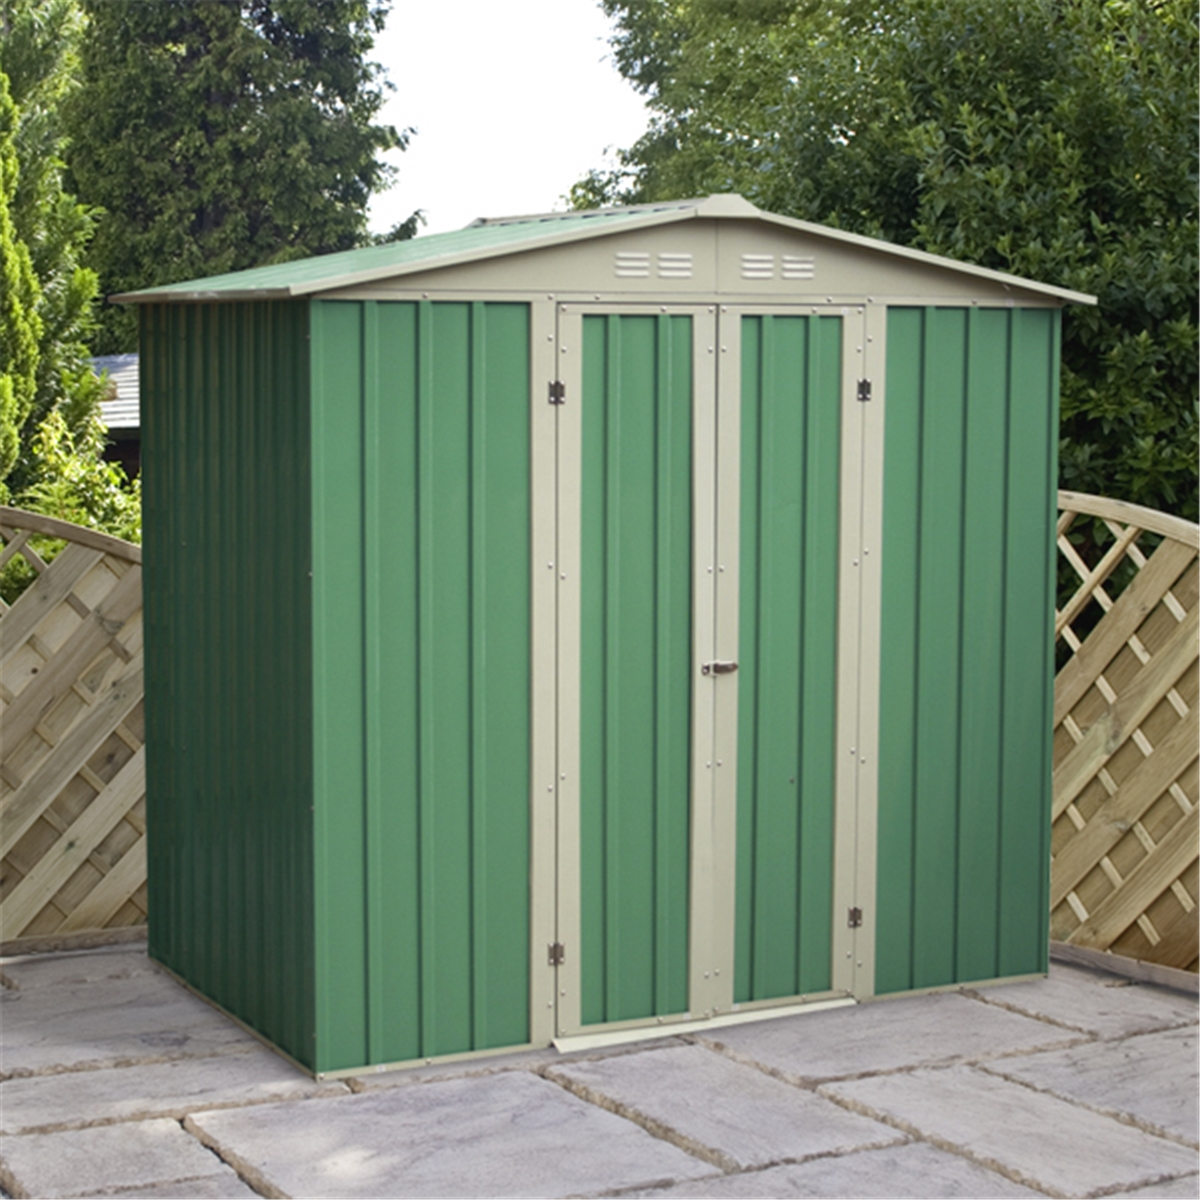 6 x 4 value apex metal garden shed for Apex garden sheds